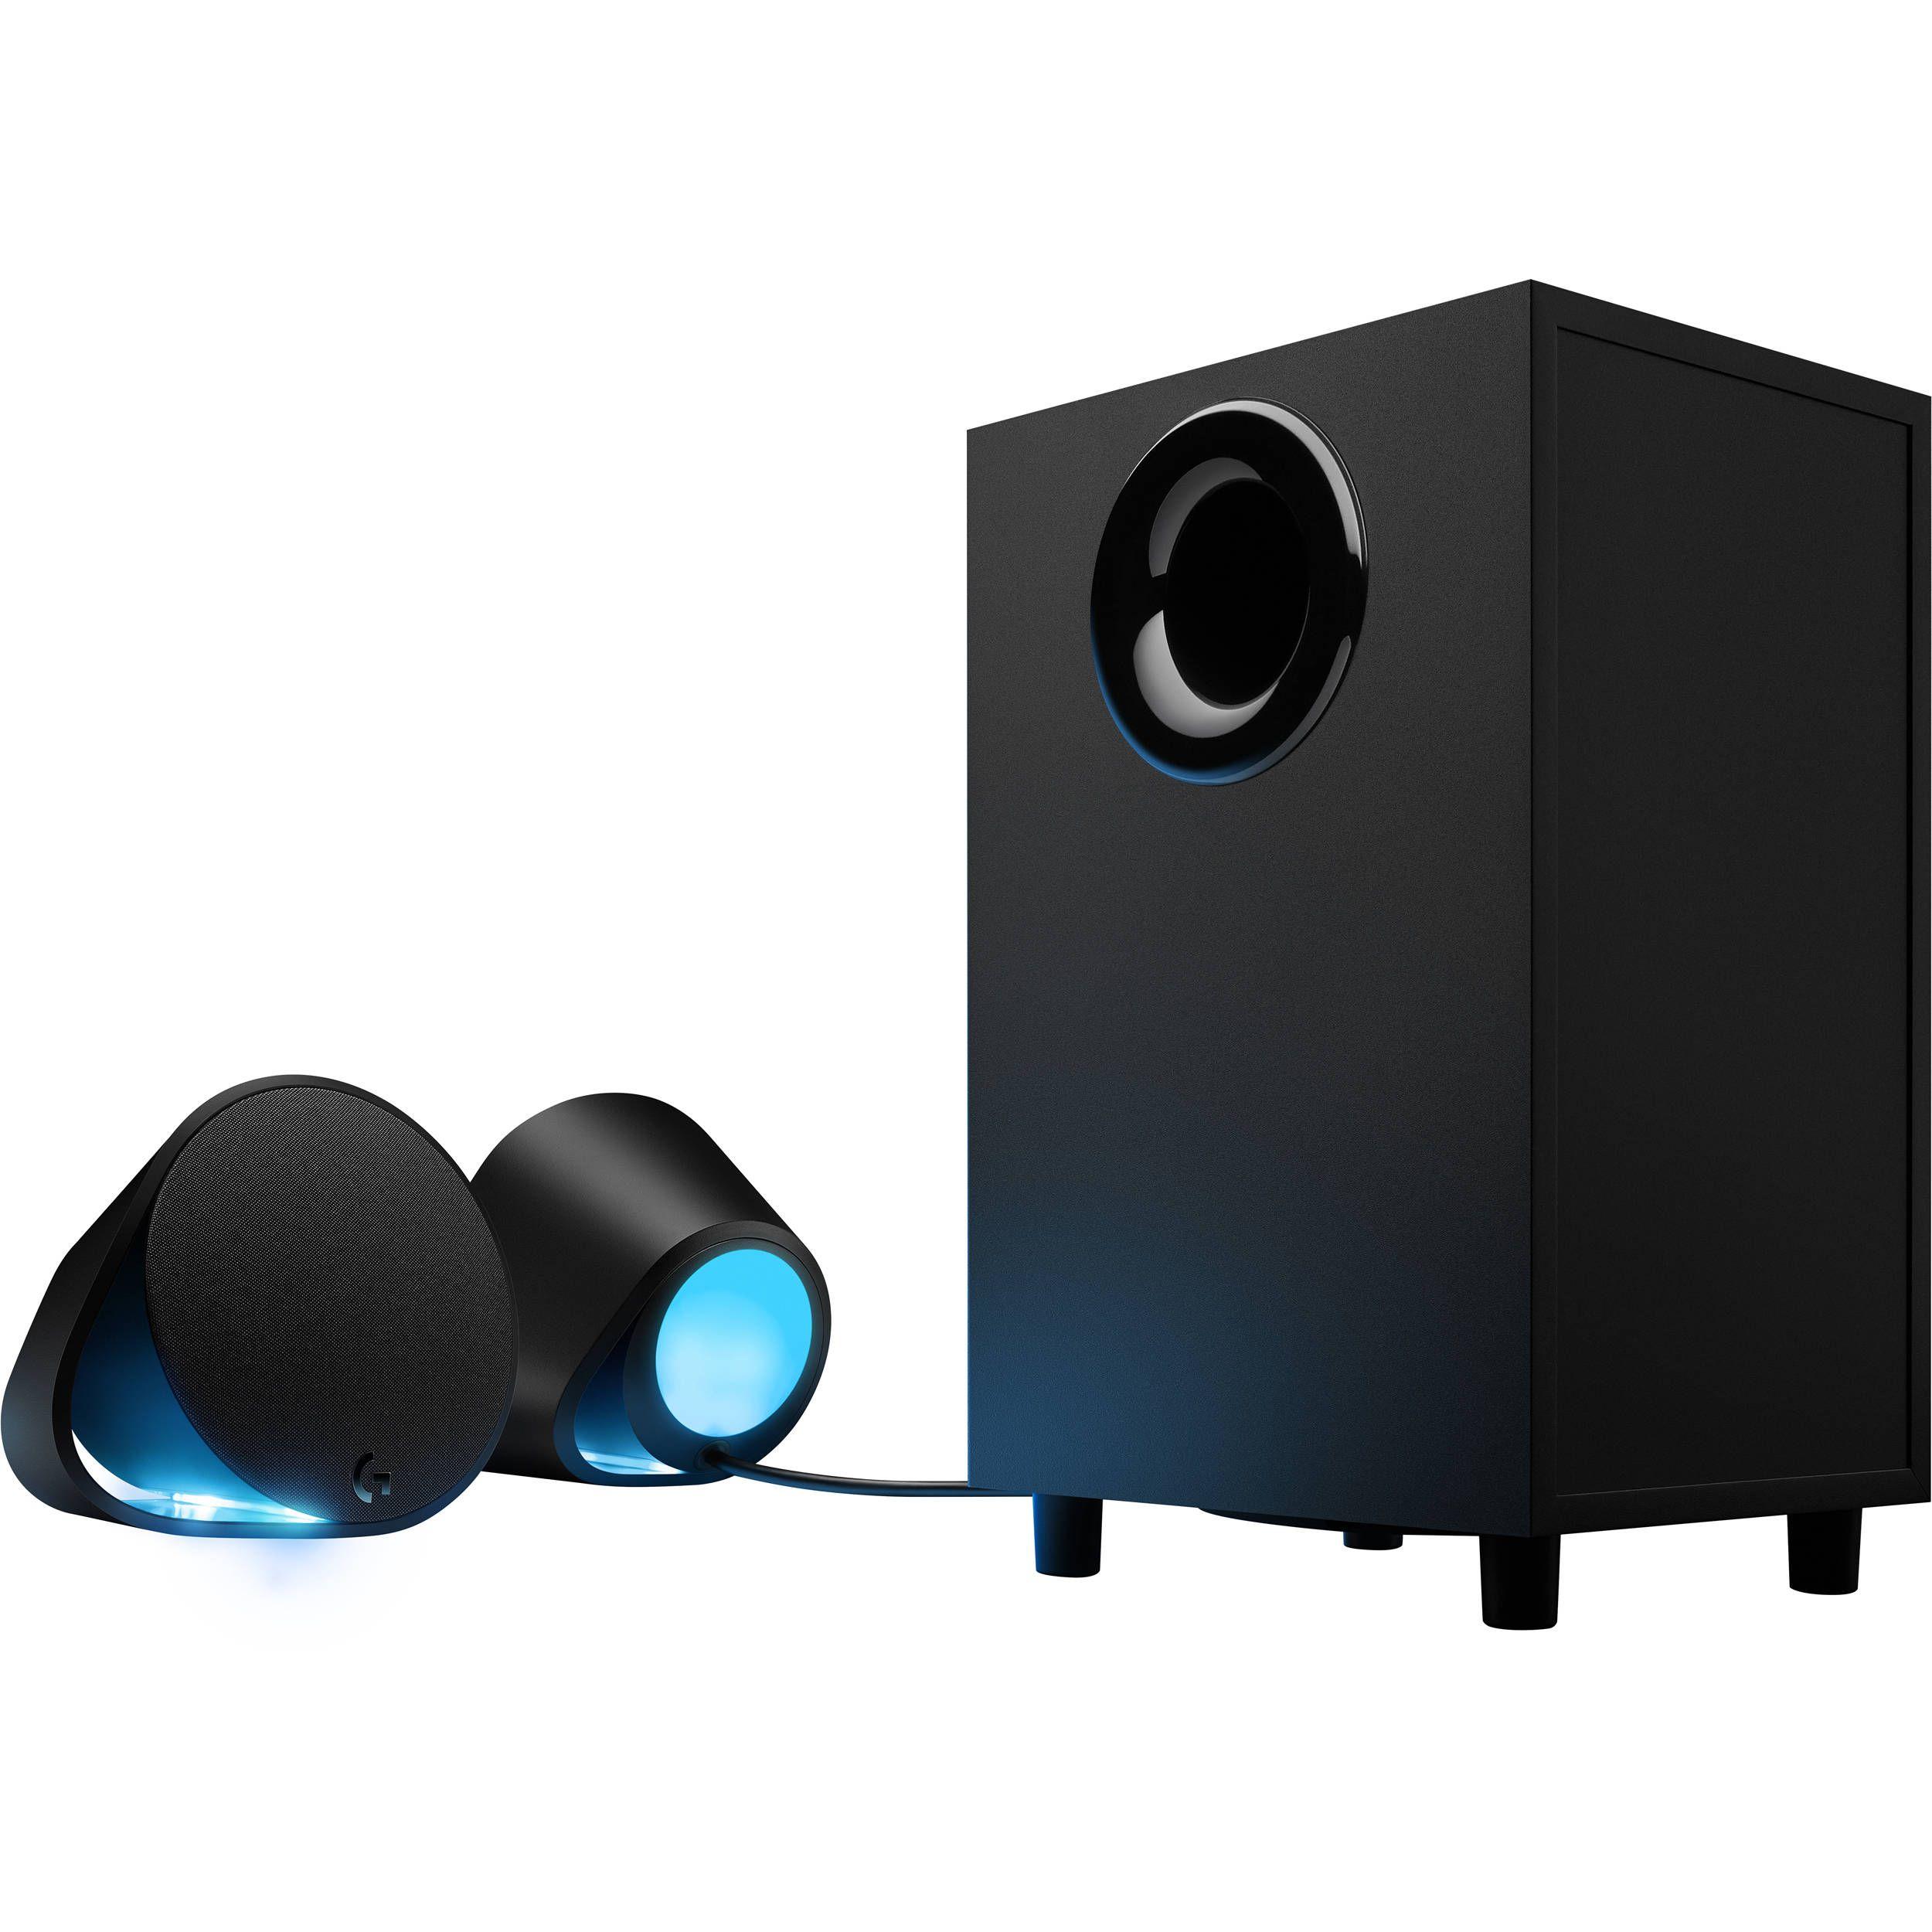 Głośniki Logitech G560 LightSync RGB @Amazon.fr